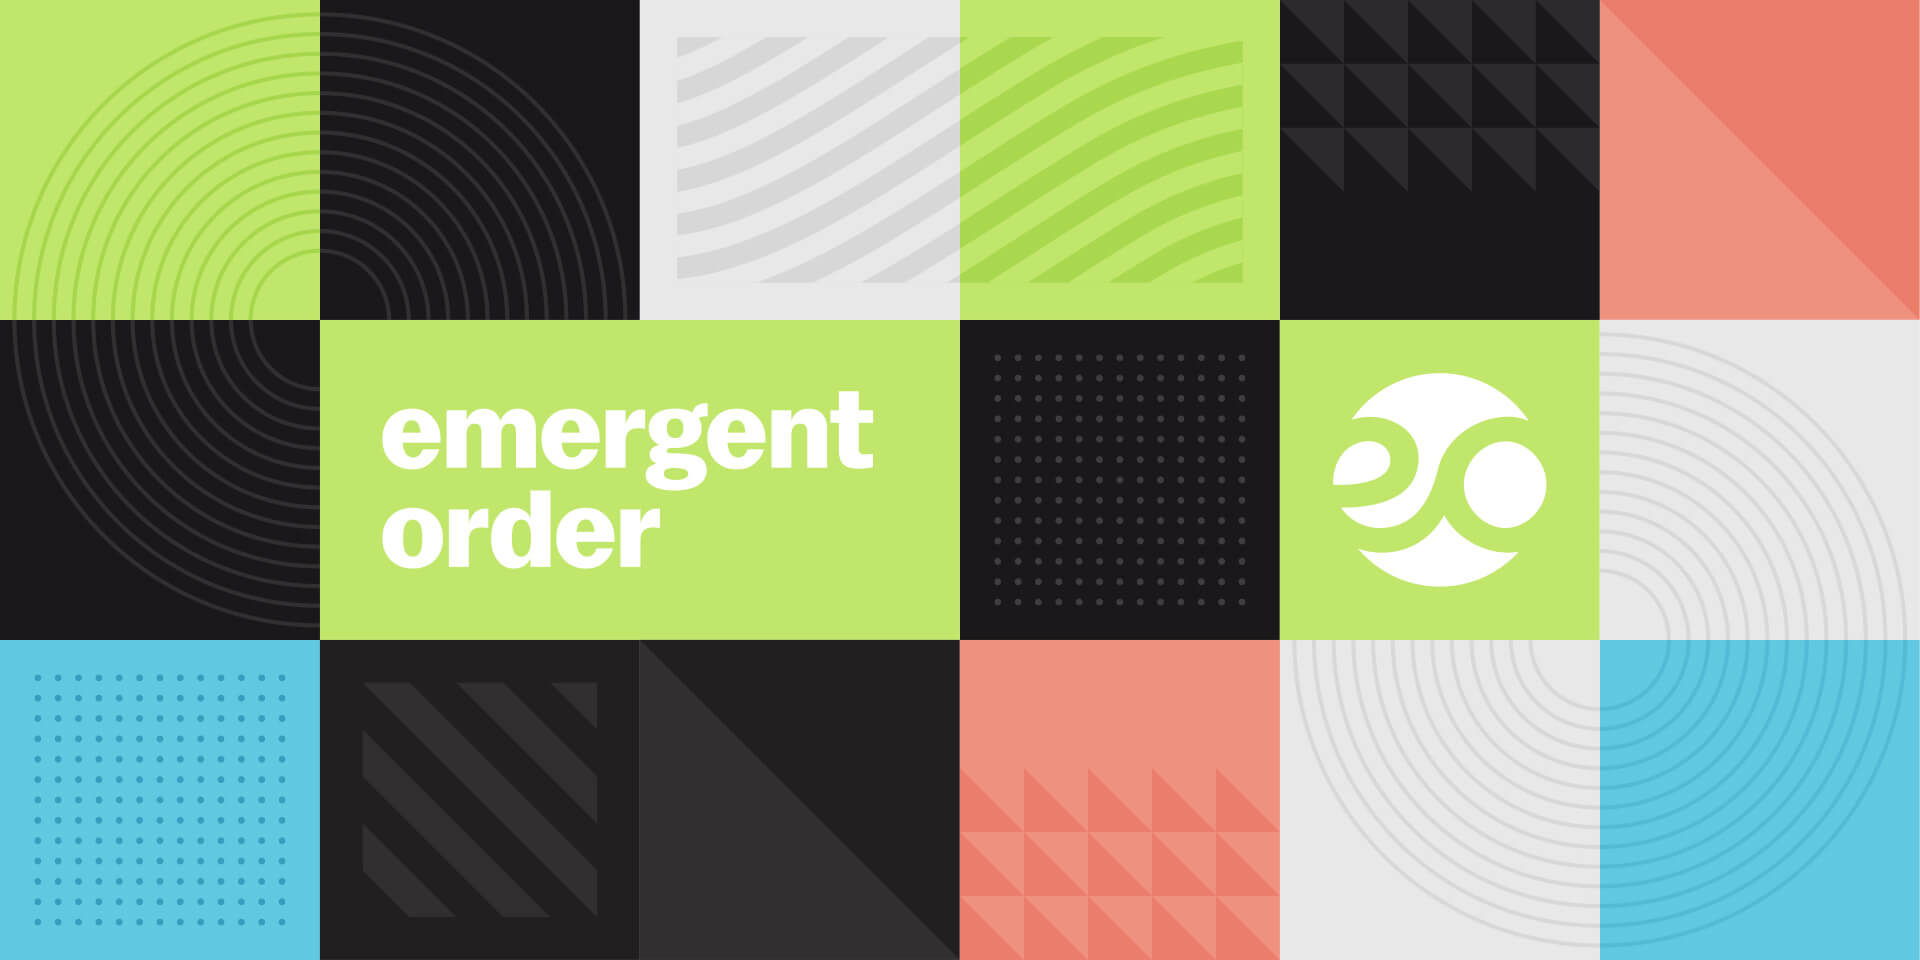 studio-malagon-emergent-order-hero-static